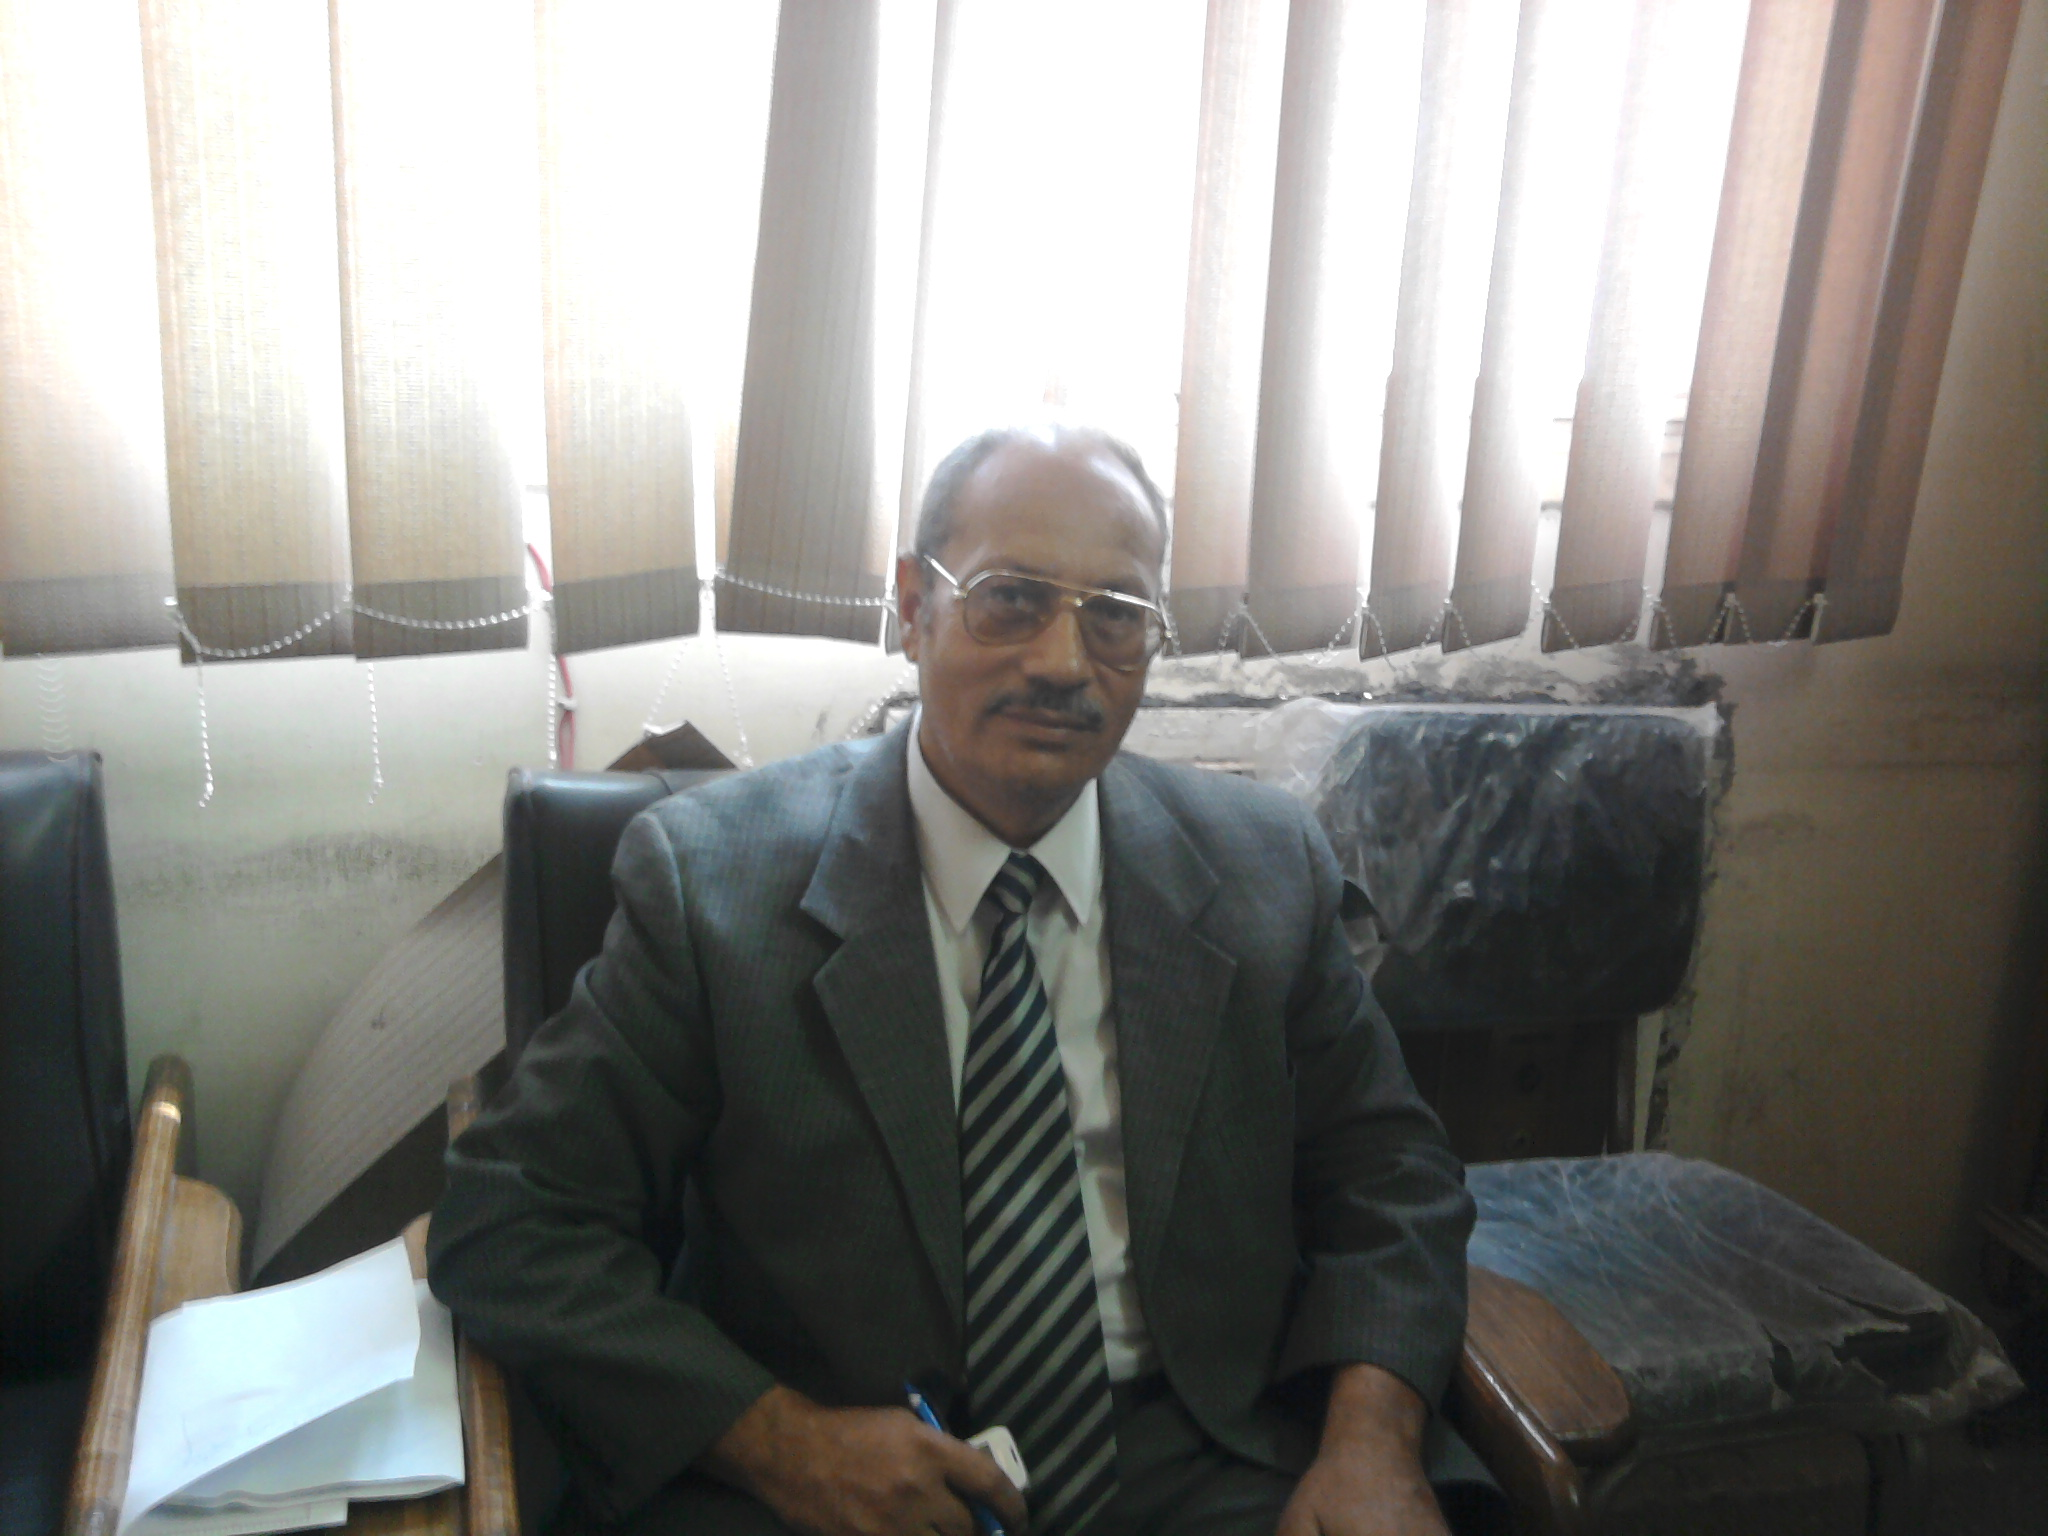 Hassan Desouky